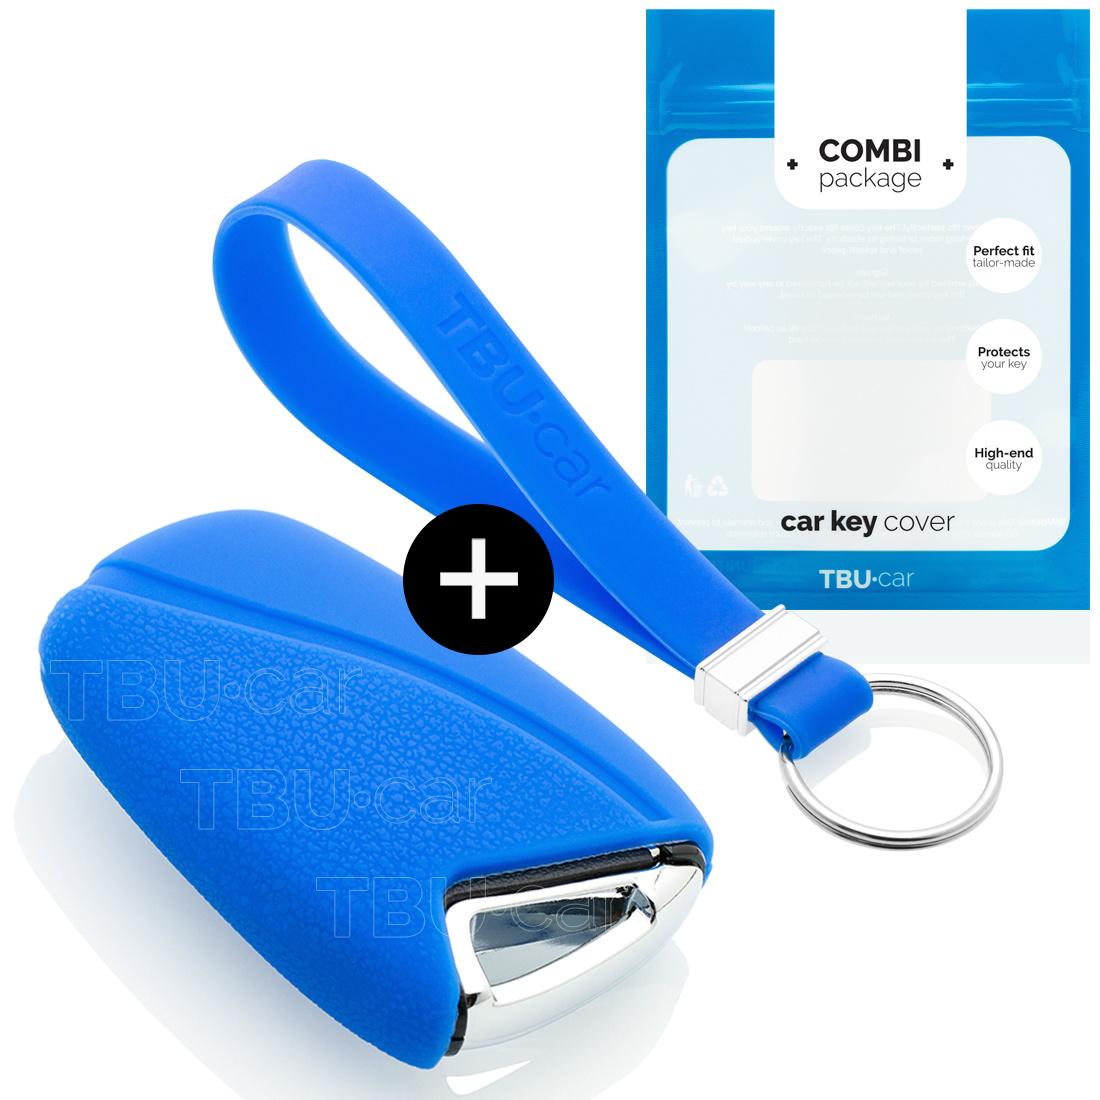 Hyundai Autoschlüssel Hülle - Silikon Schutzhülle - Schlüsselhülle Cover - Blau